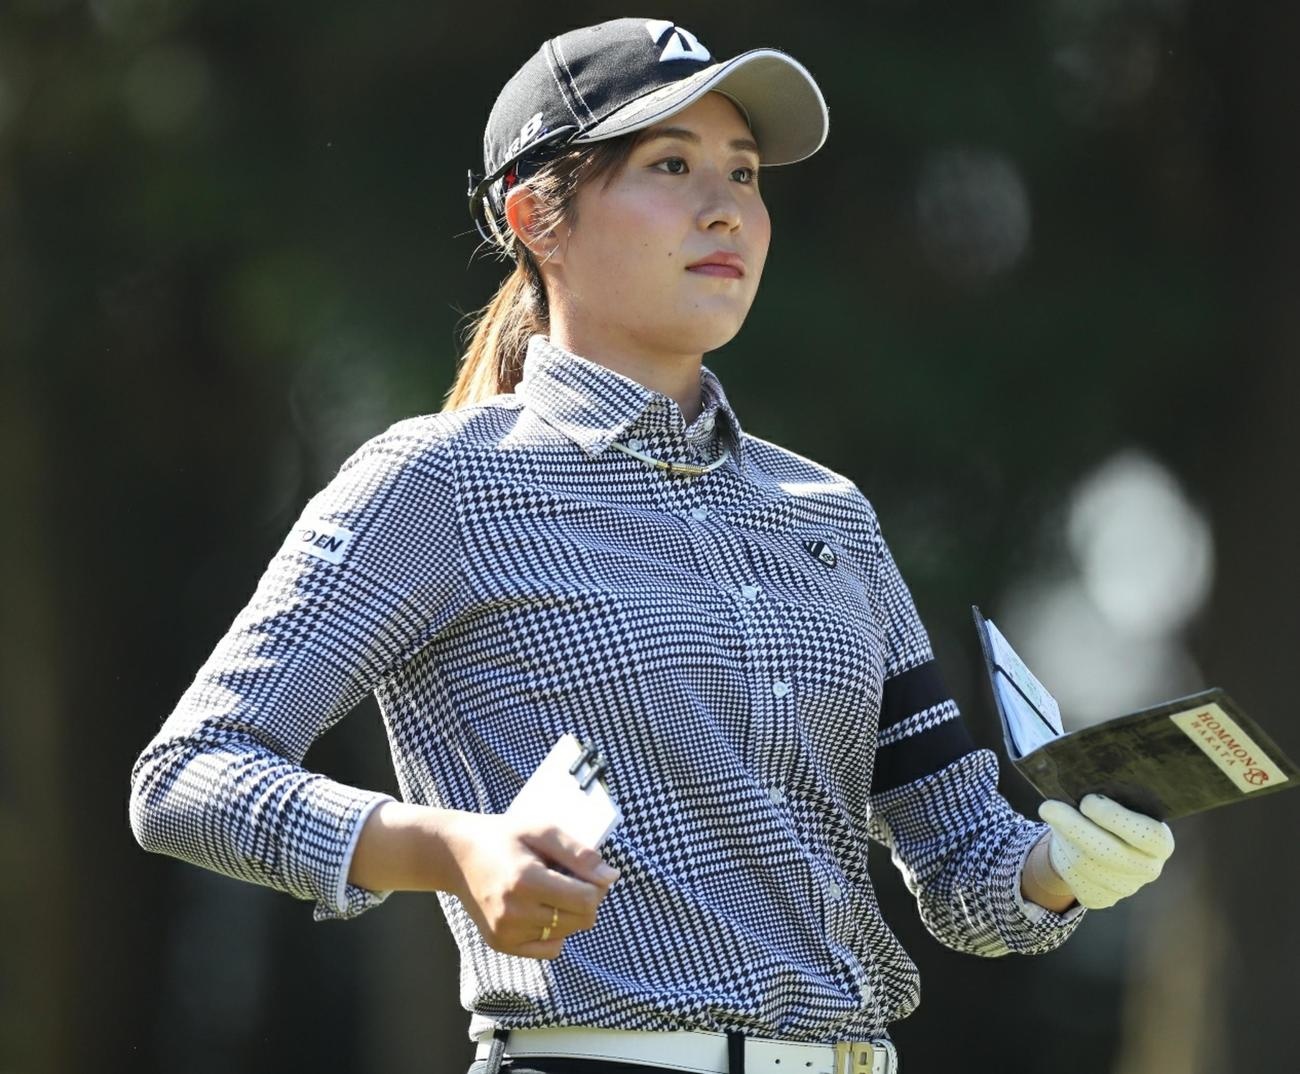 https://www.nikkansports.com/sports/golf/news/img/202011070000123-w1300_20.jpg